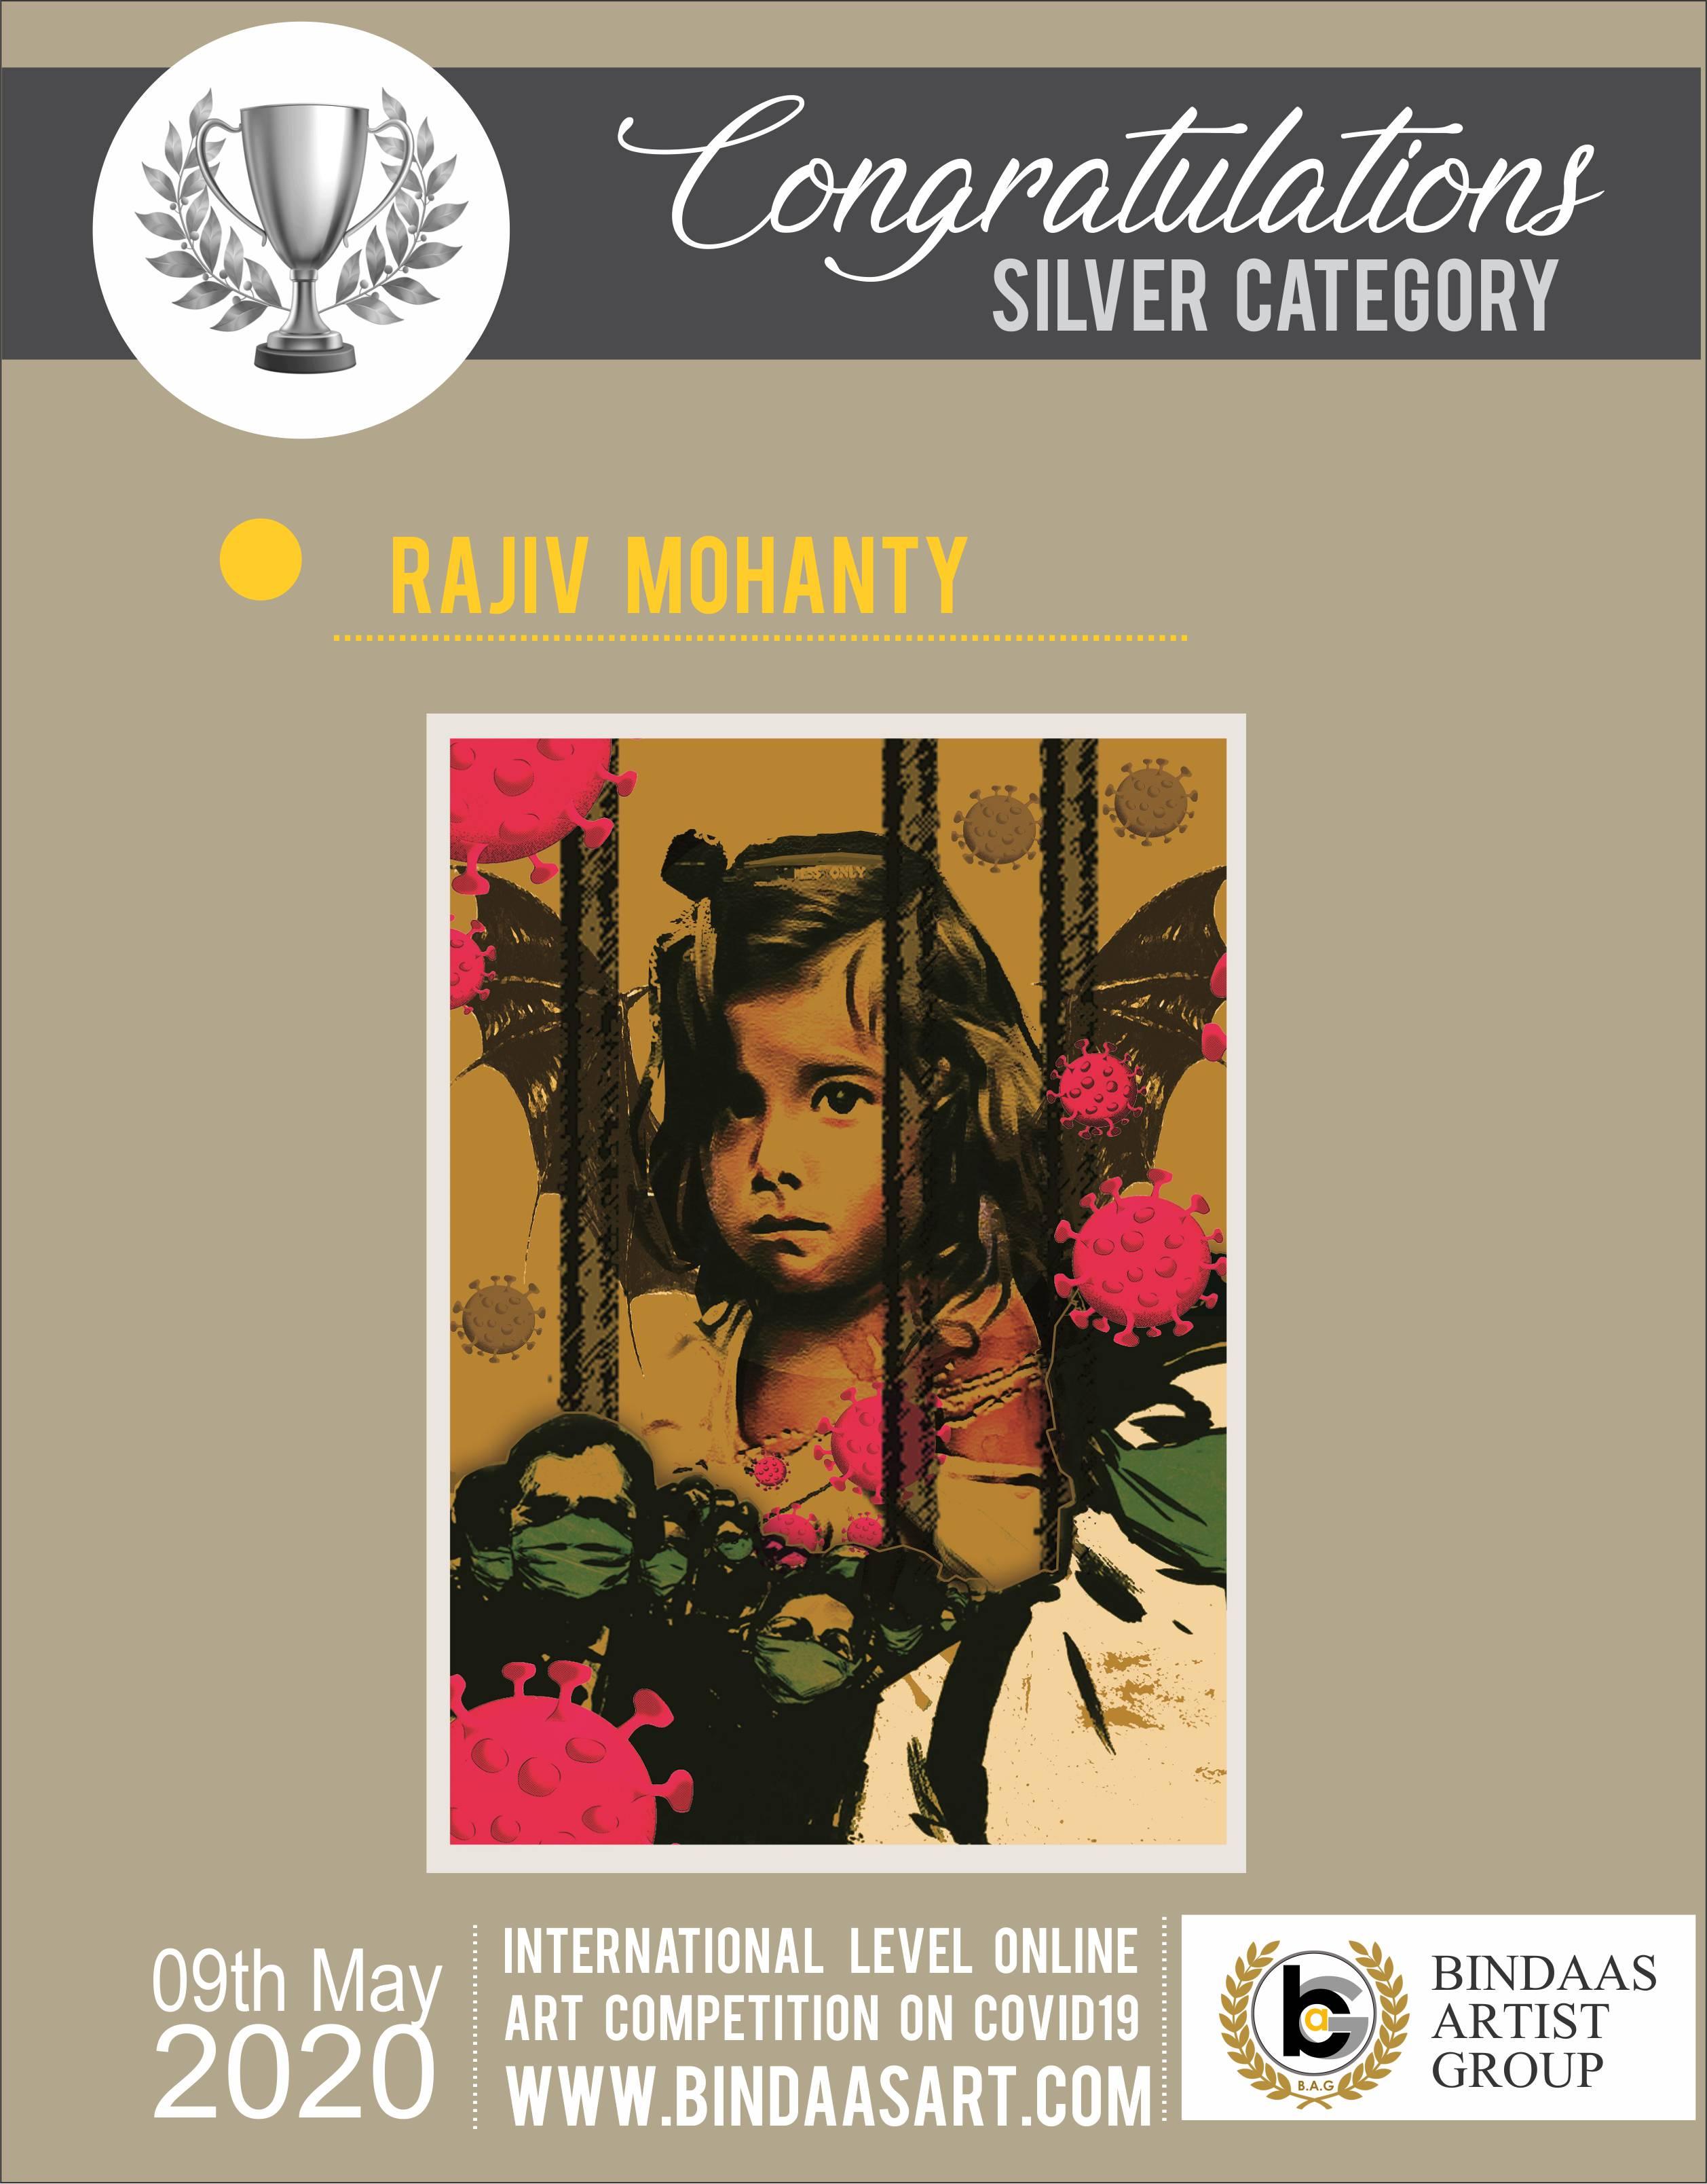 Rajiv Mohanty